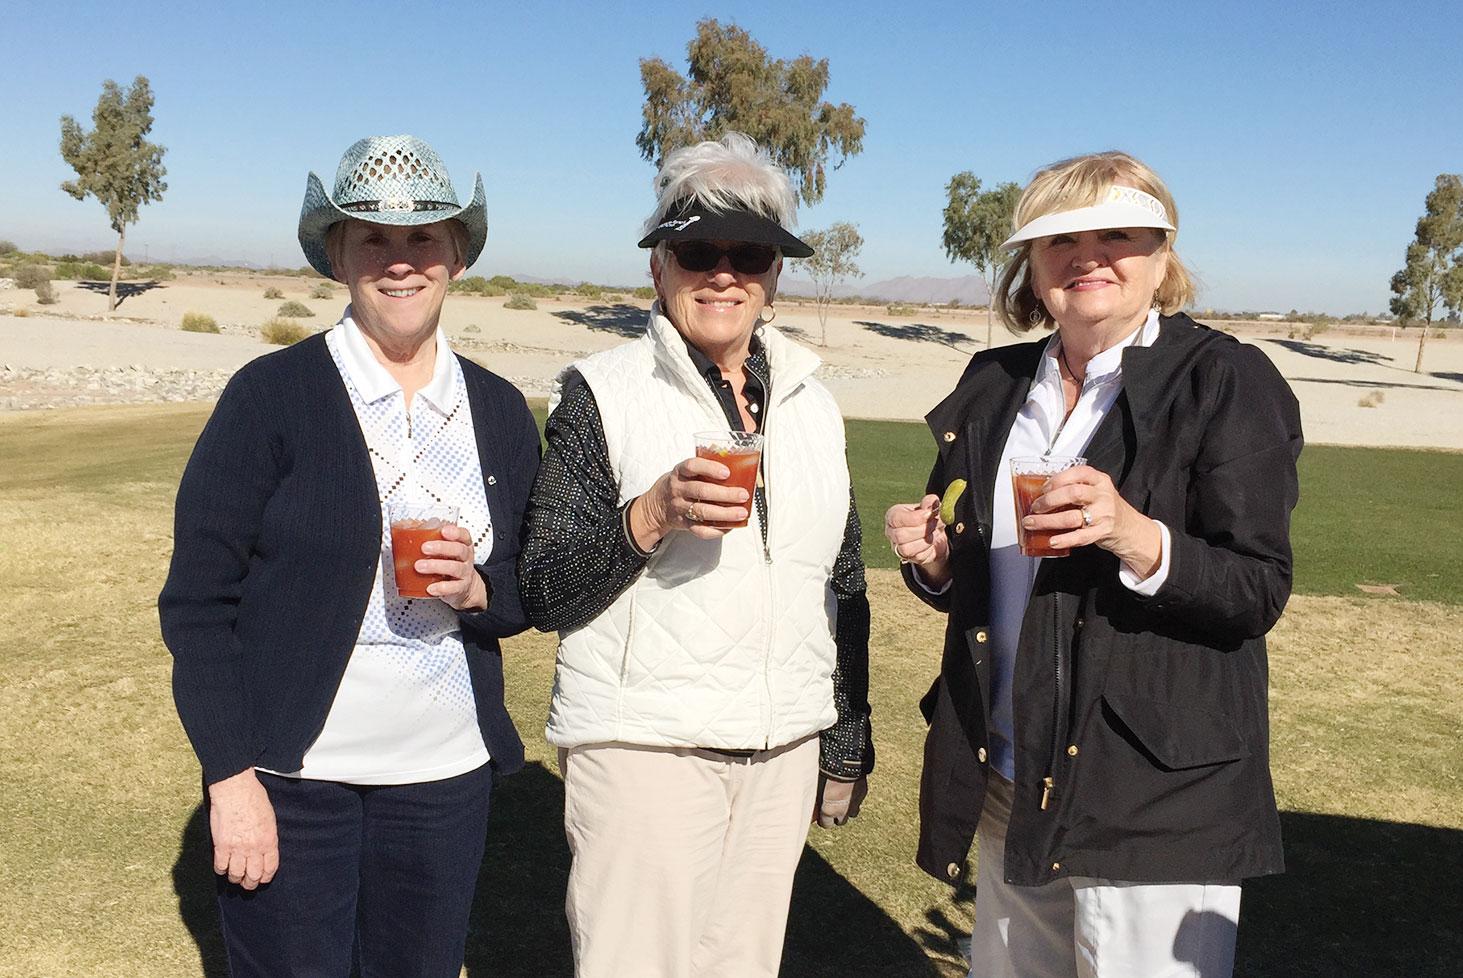 Group of three celebrating a birdie with Bloody Marys: Sandy Horzauk, Karen Zuniga and Jeri Srenaski.